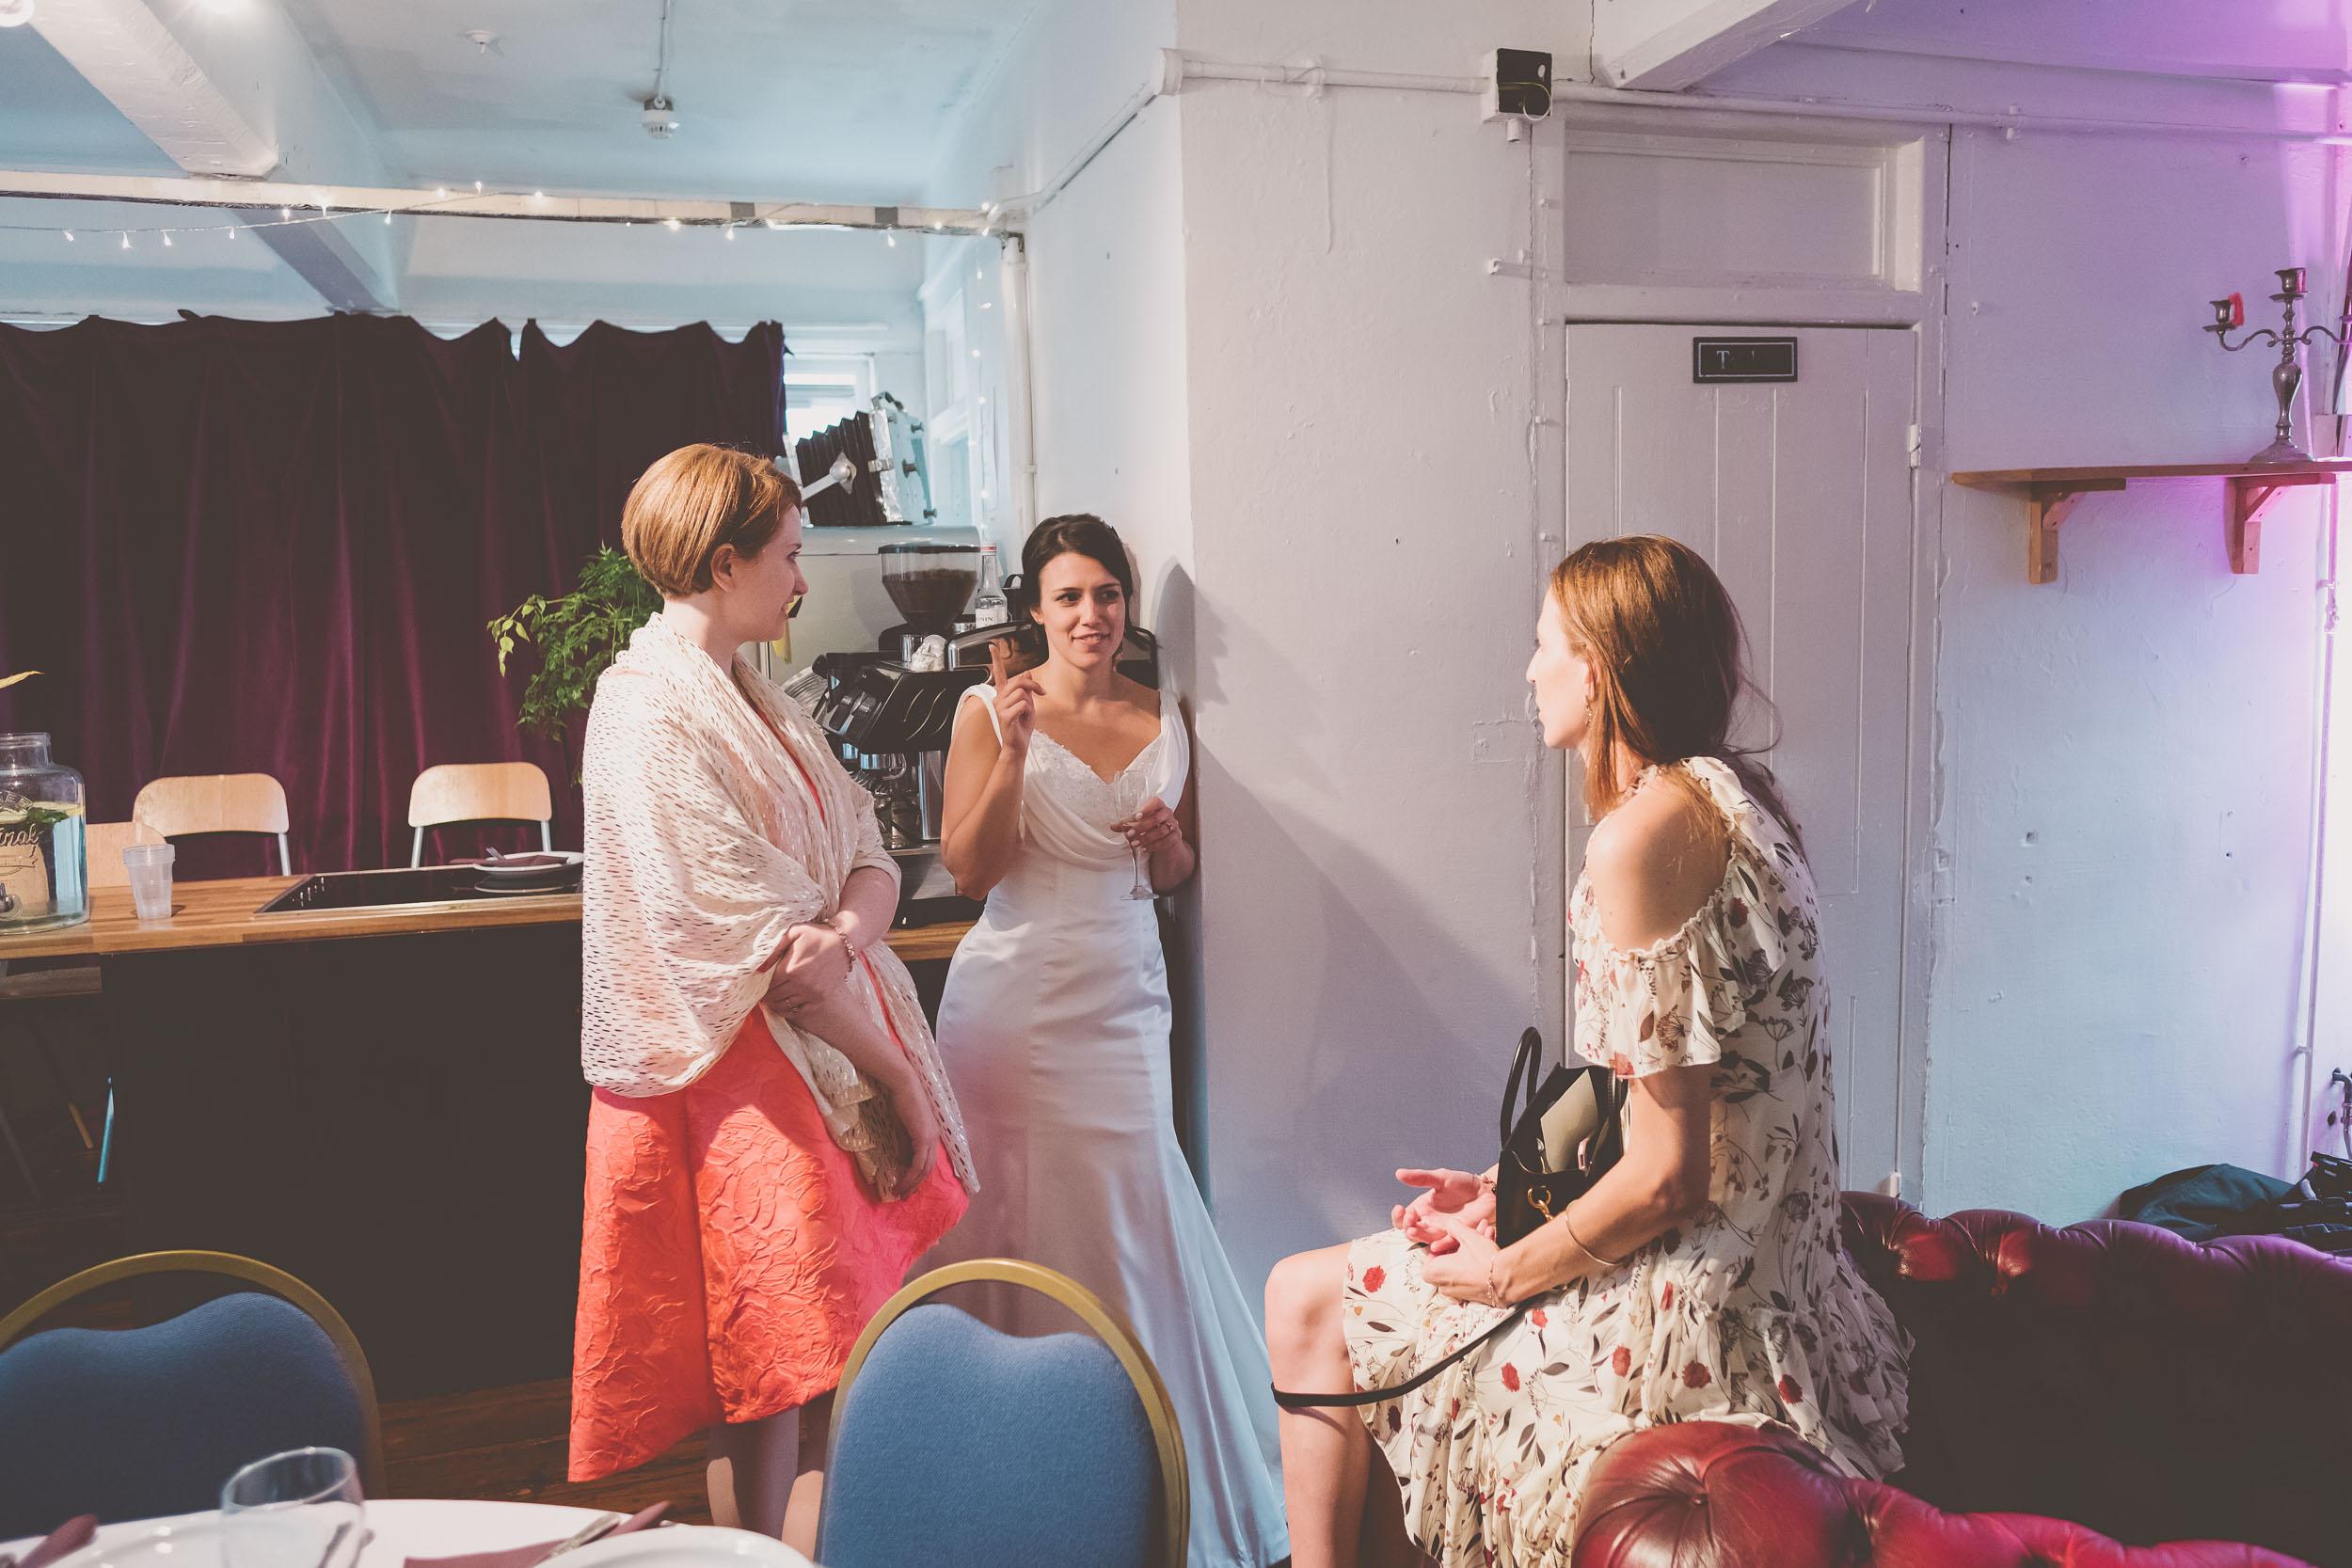 islington-town-hall-4th-floor-studios-wedding331.jpg